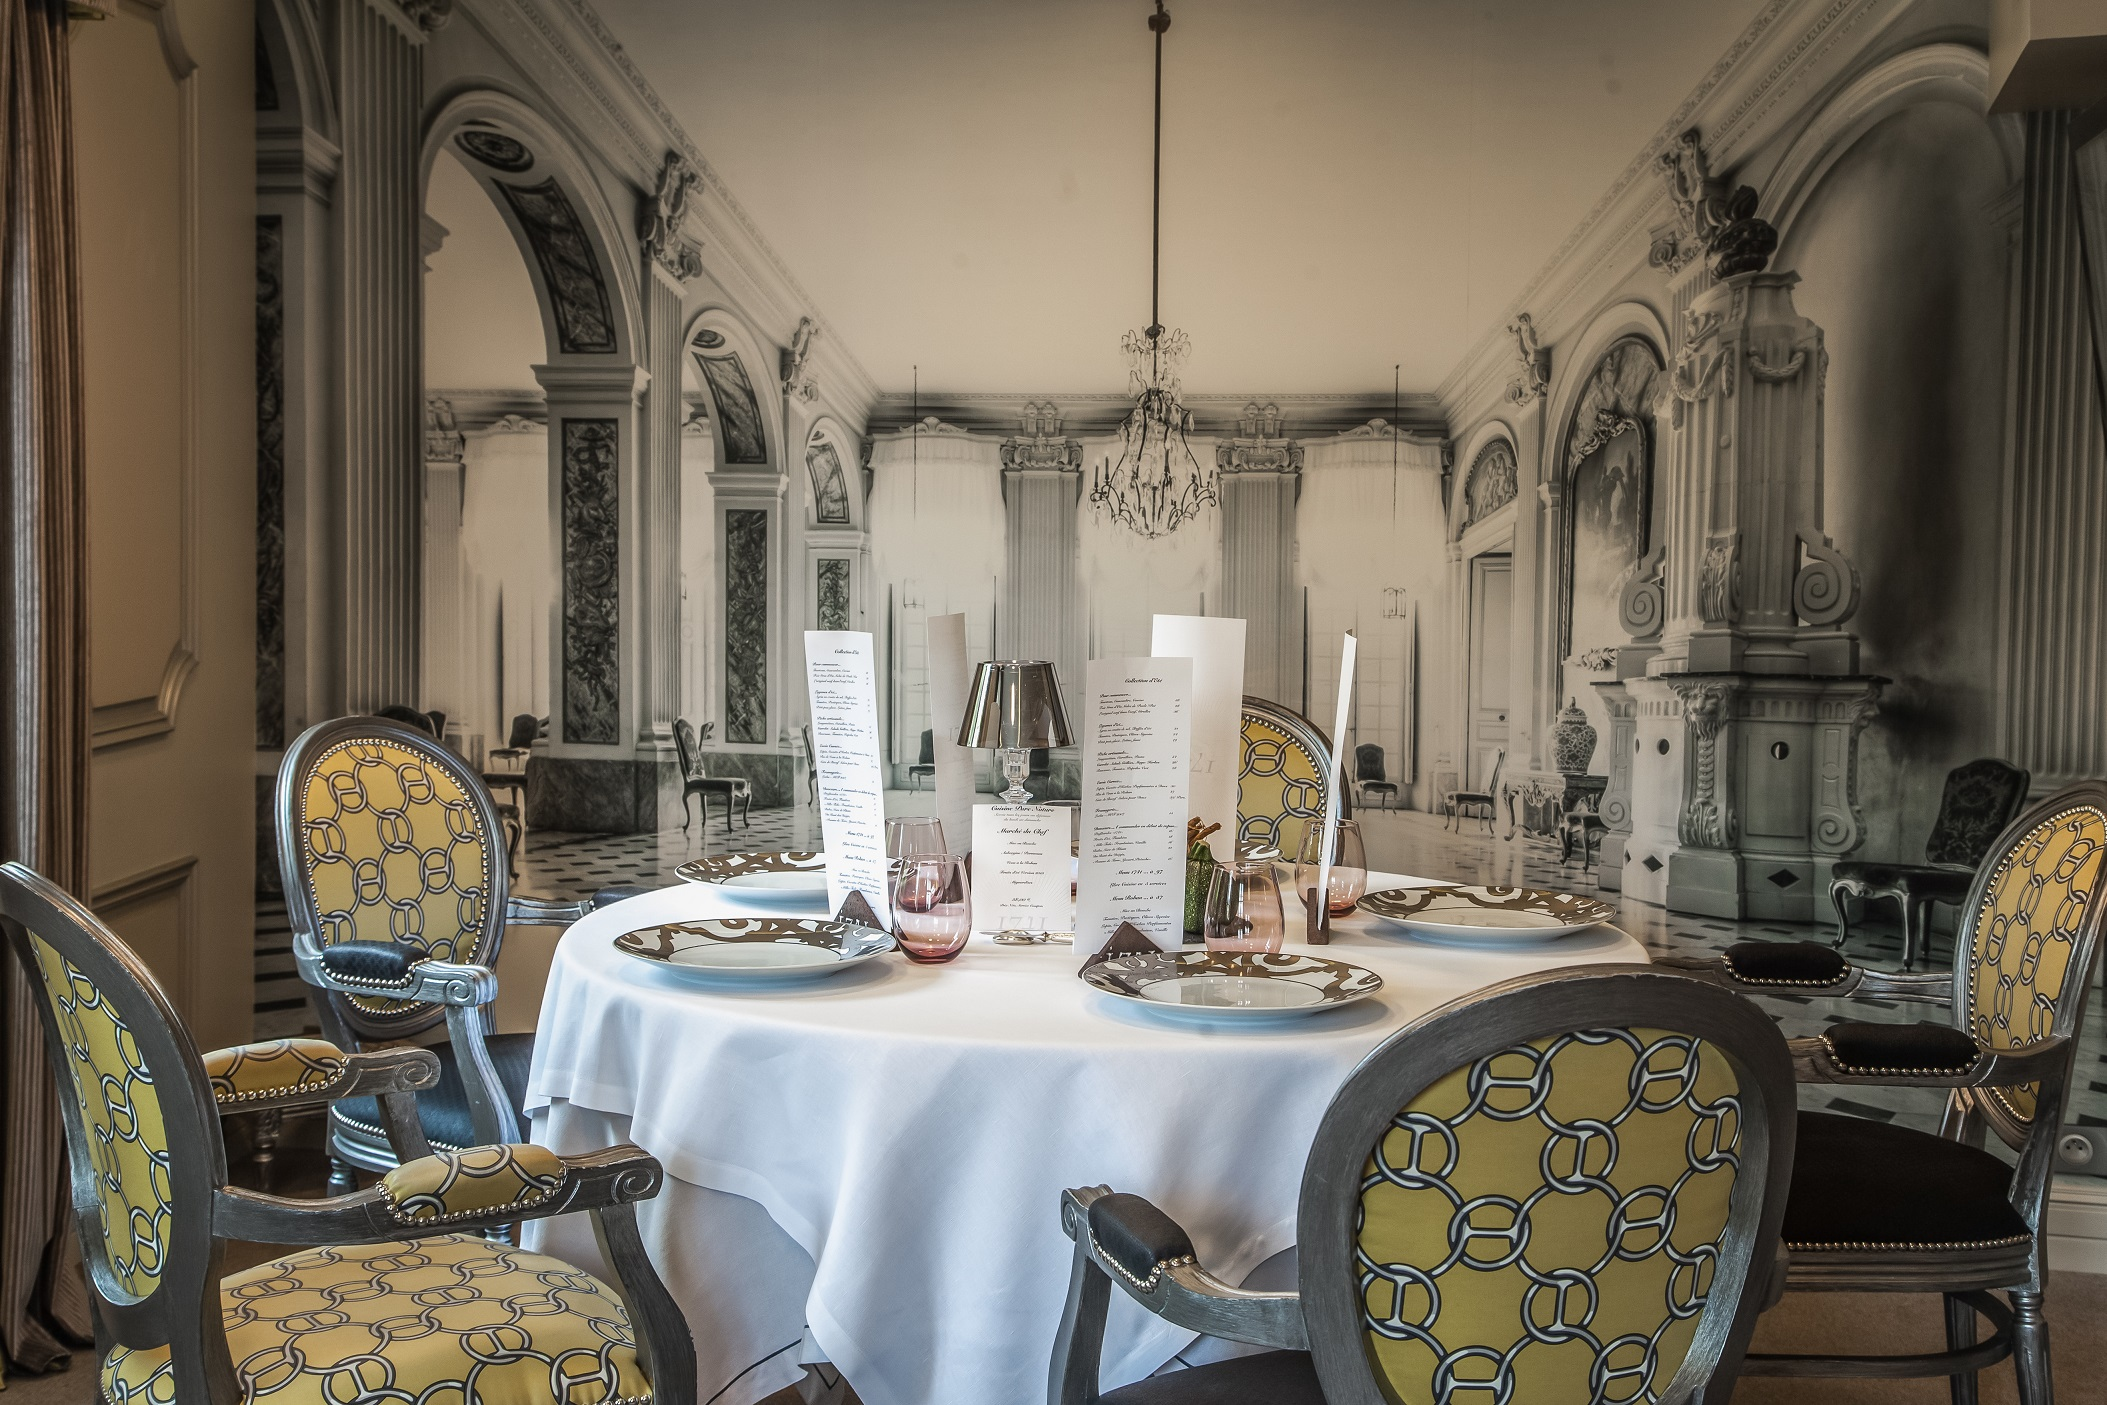 Where to eat in Strasbourg - restaurant guide (Cond Nast Traveller)